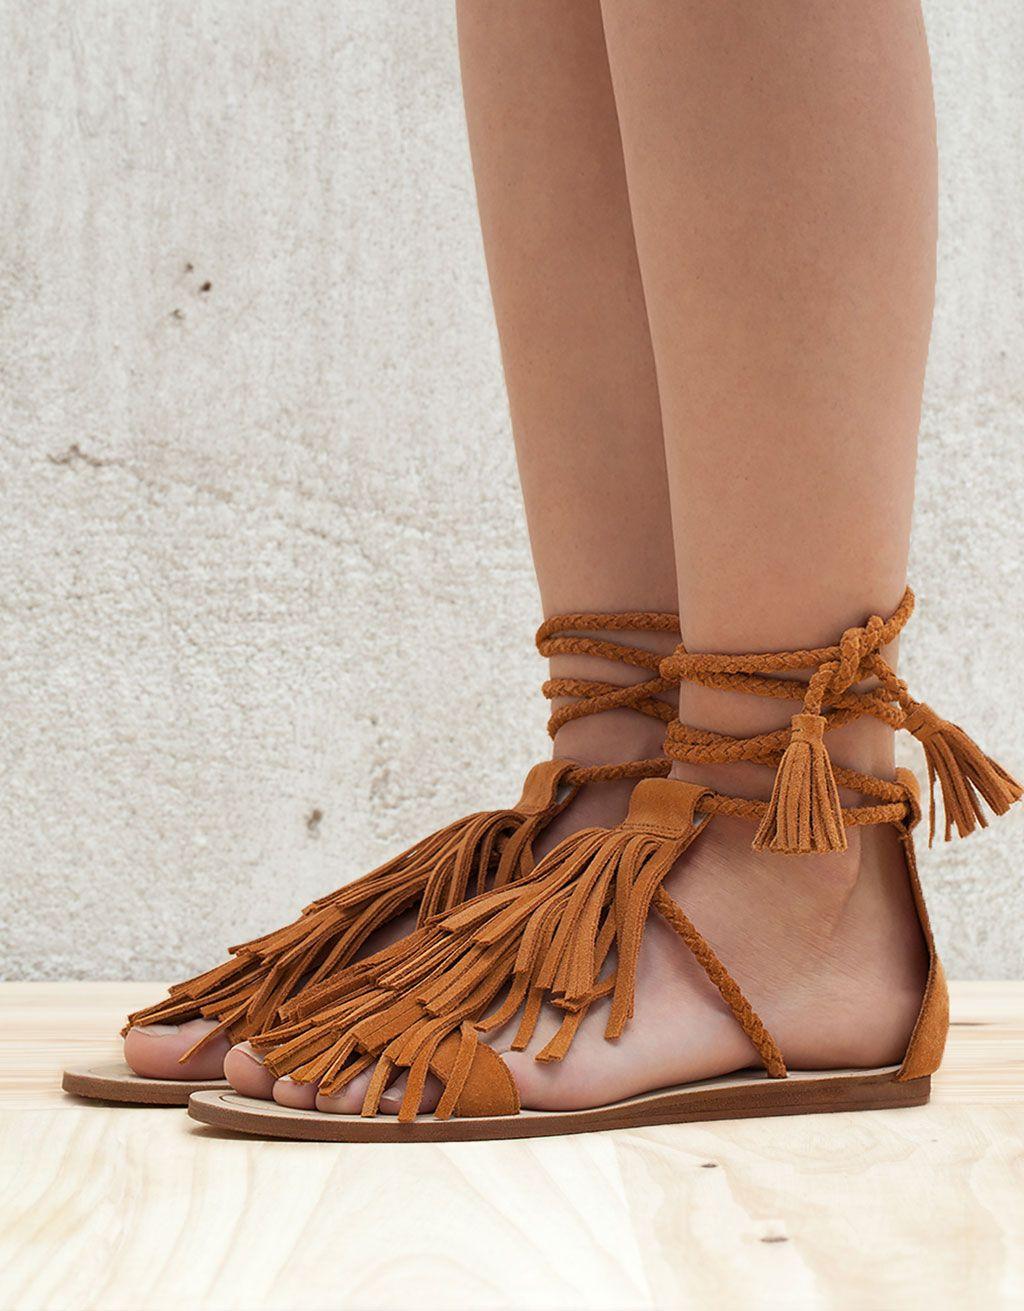 sandales plates à franges cuir - sandales plates - bershka france